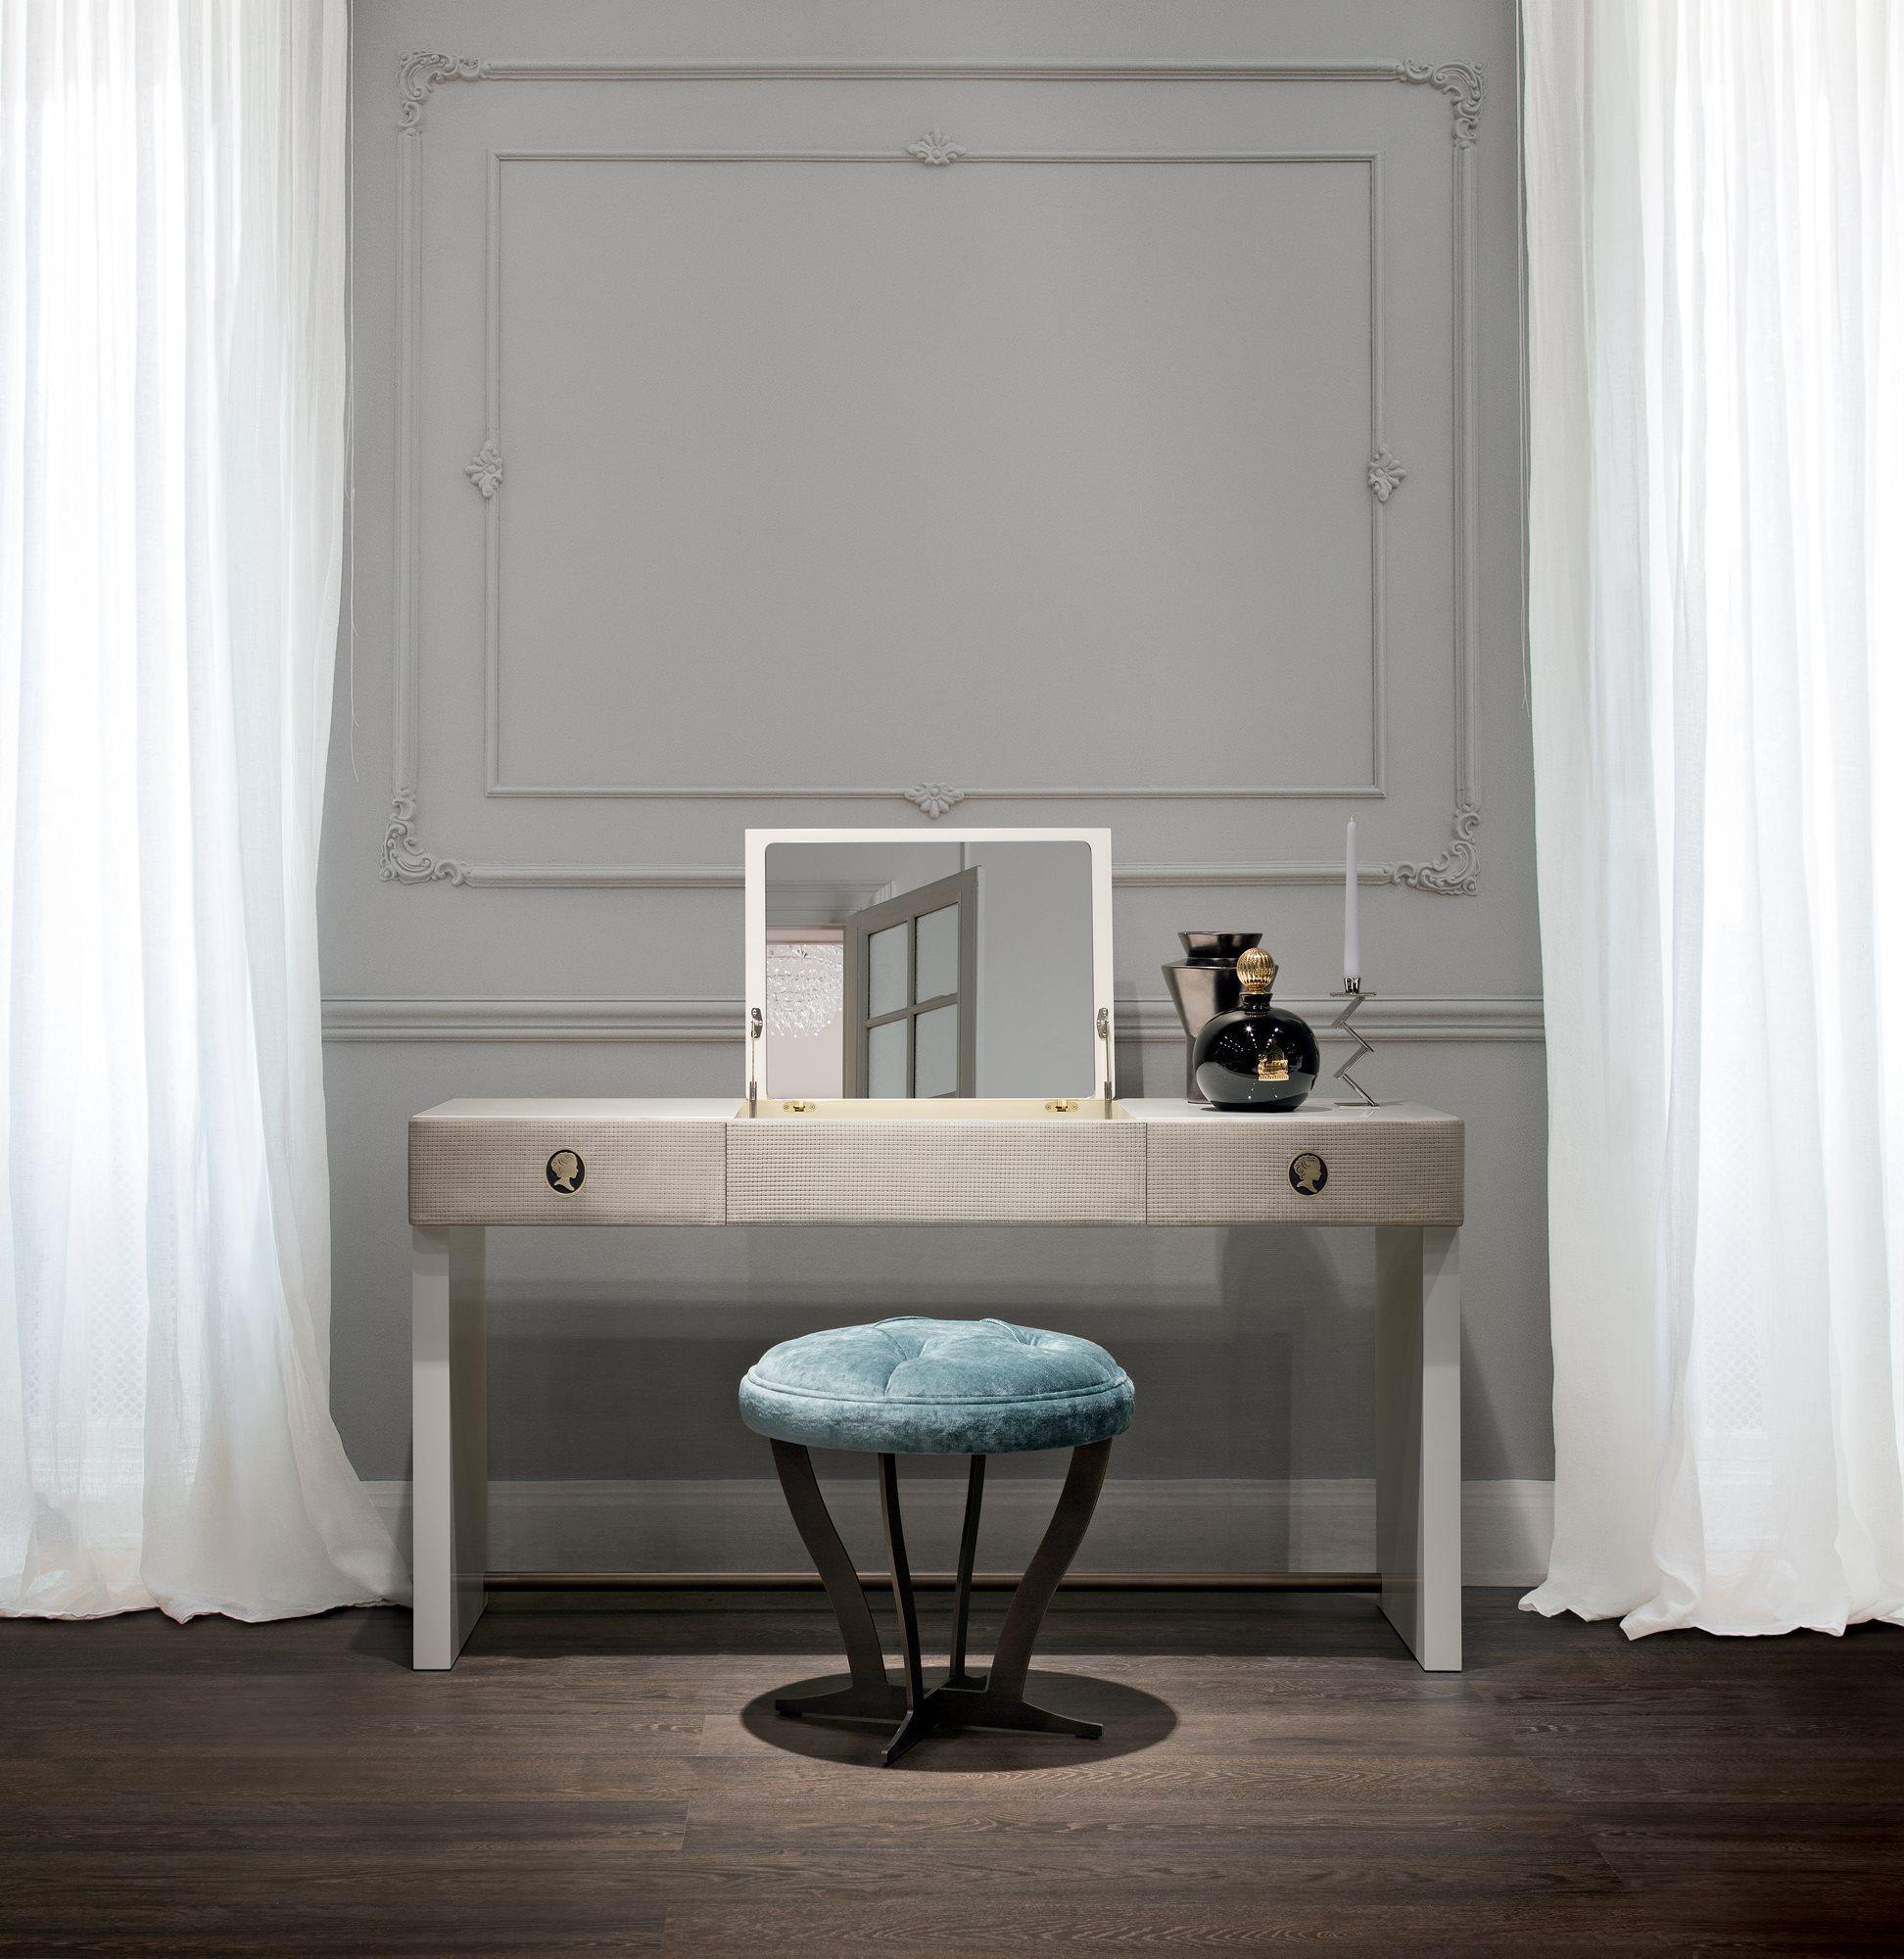 Alberta Salotti (RU) Туалетный столик Jasmine от итальянского бренда Alberta salotti